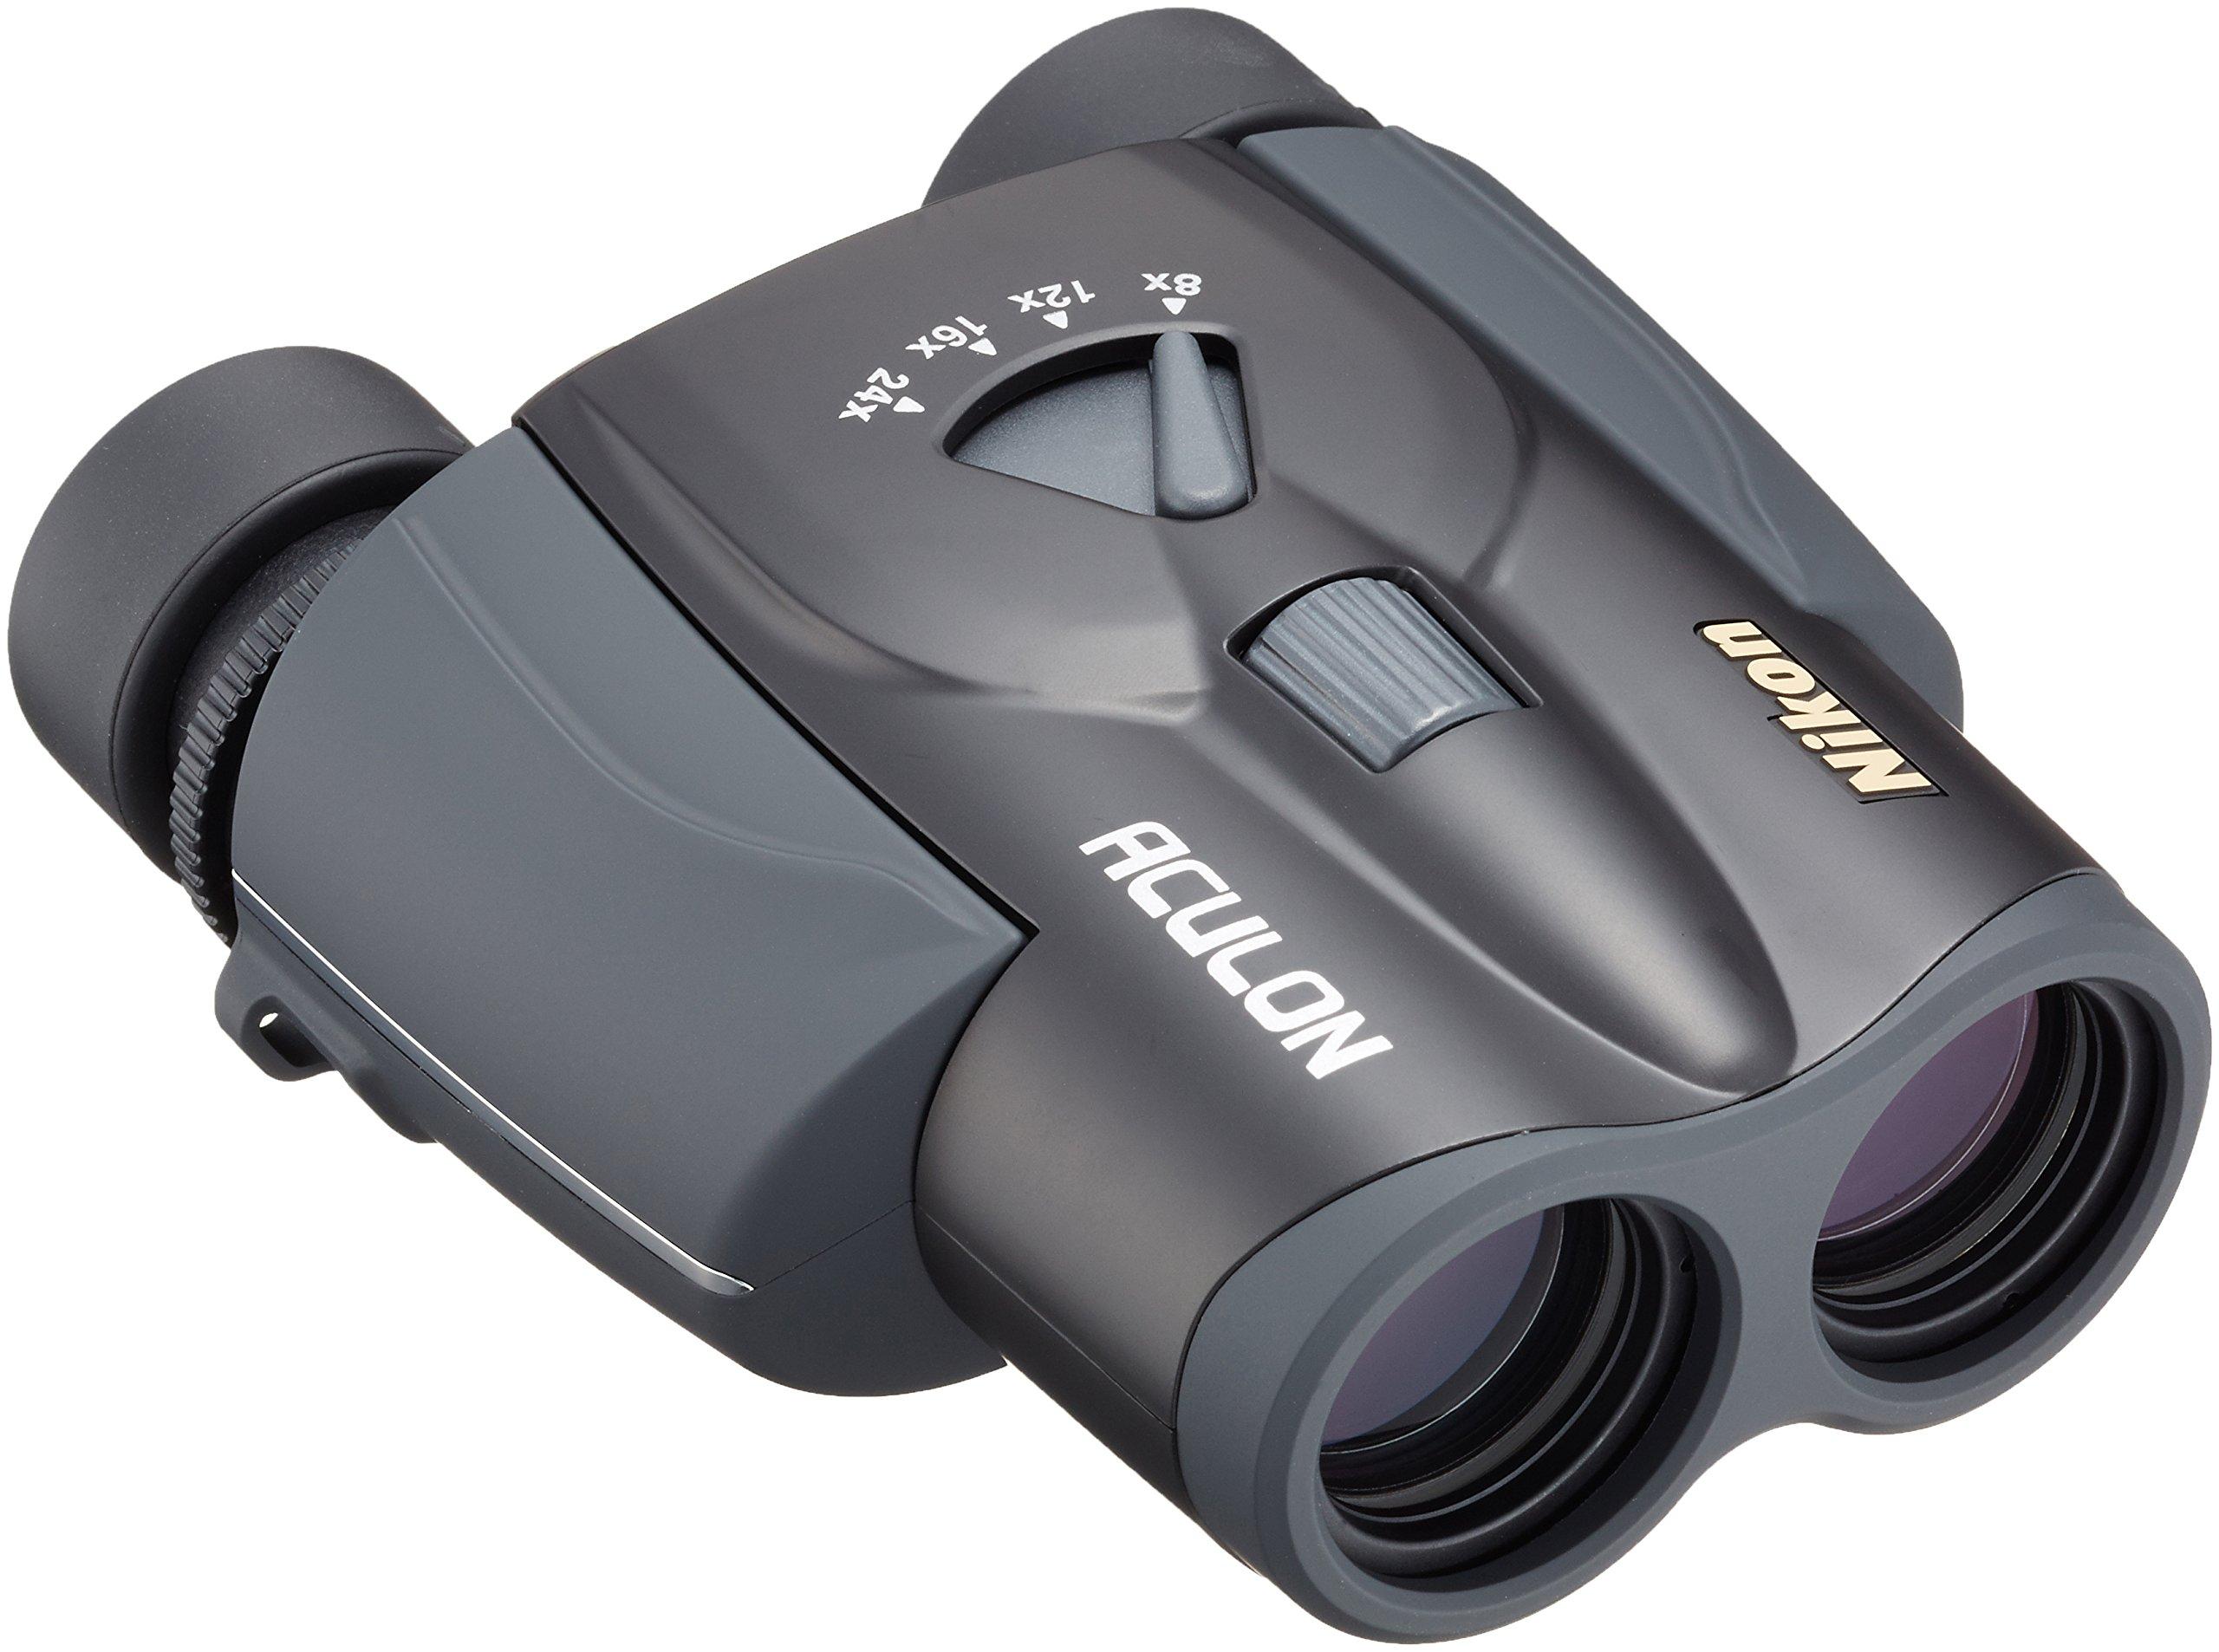 Binocular Cases & Accessories Velbon Binoculars Accessories Tripod Mounting Adapter Binoculars Com Holder Jp Binoculars & Telescopes